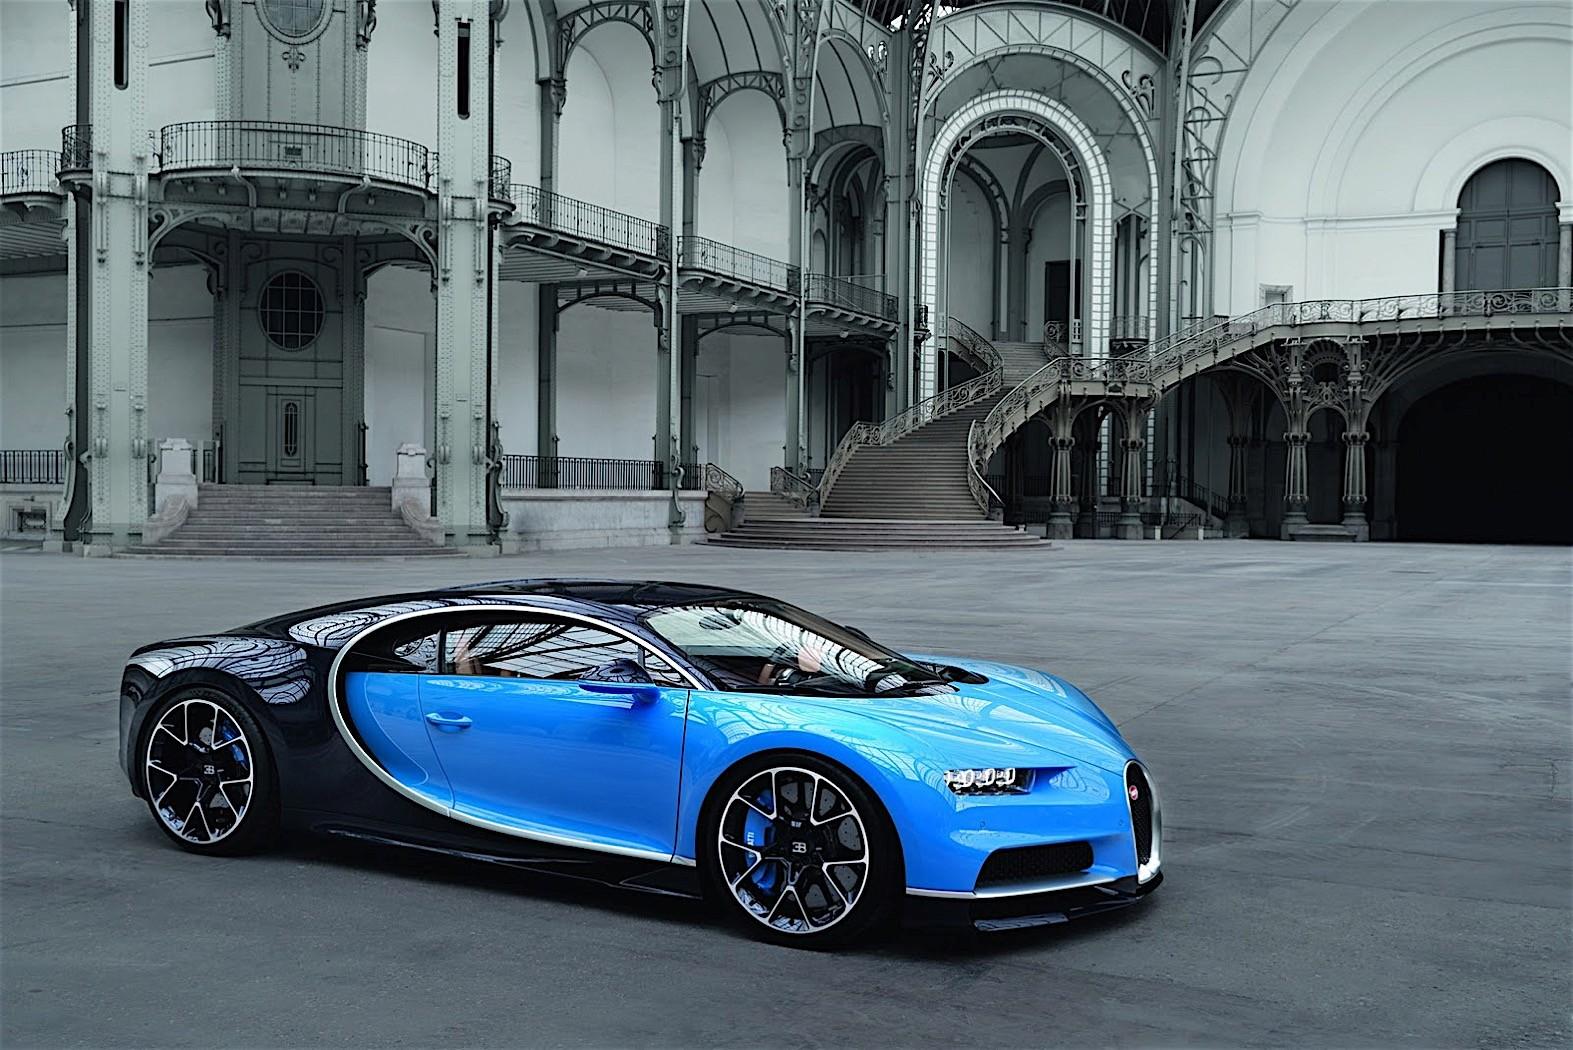 Bugatti Chiron Racecar Rendering Looks Phenomenal, Reminds ...